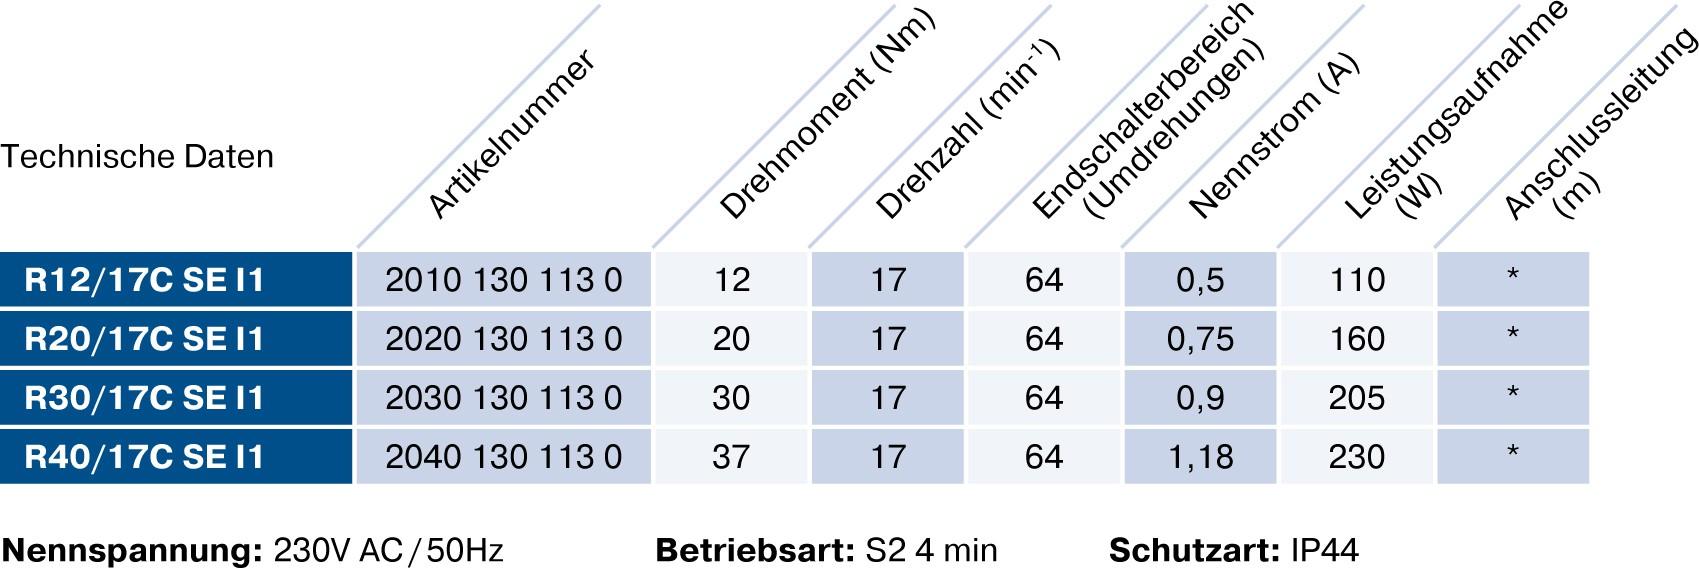 Rolladenmotor Becker R/C SEBO technische Daten